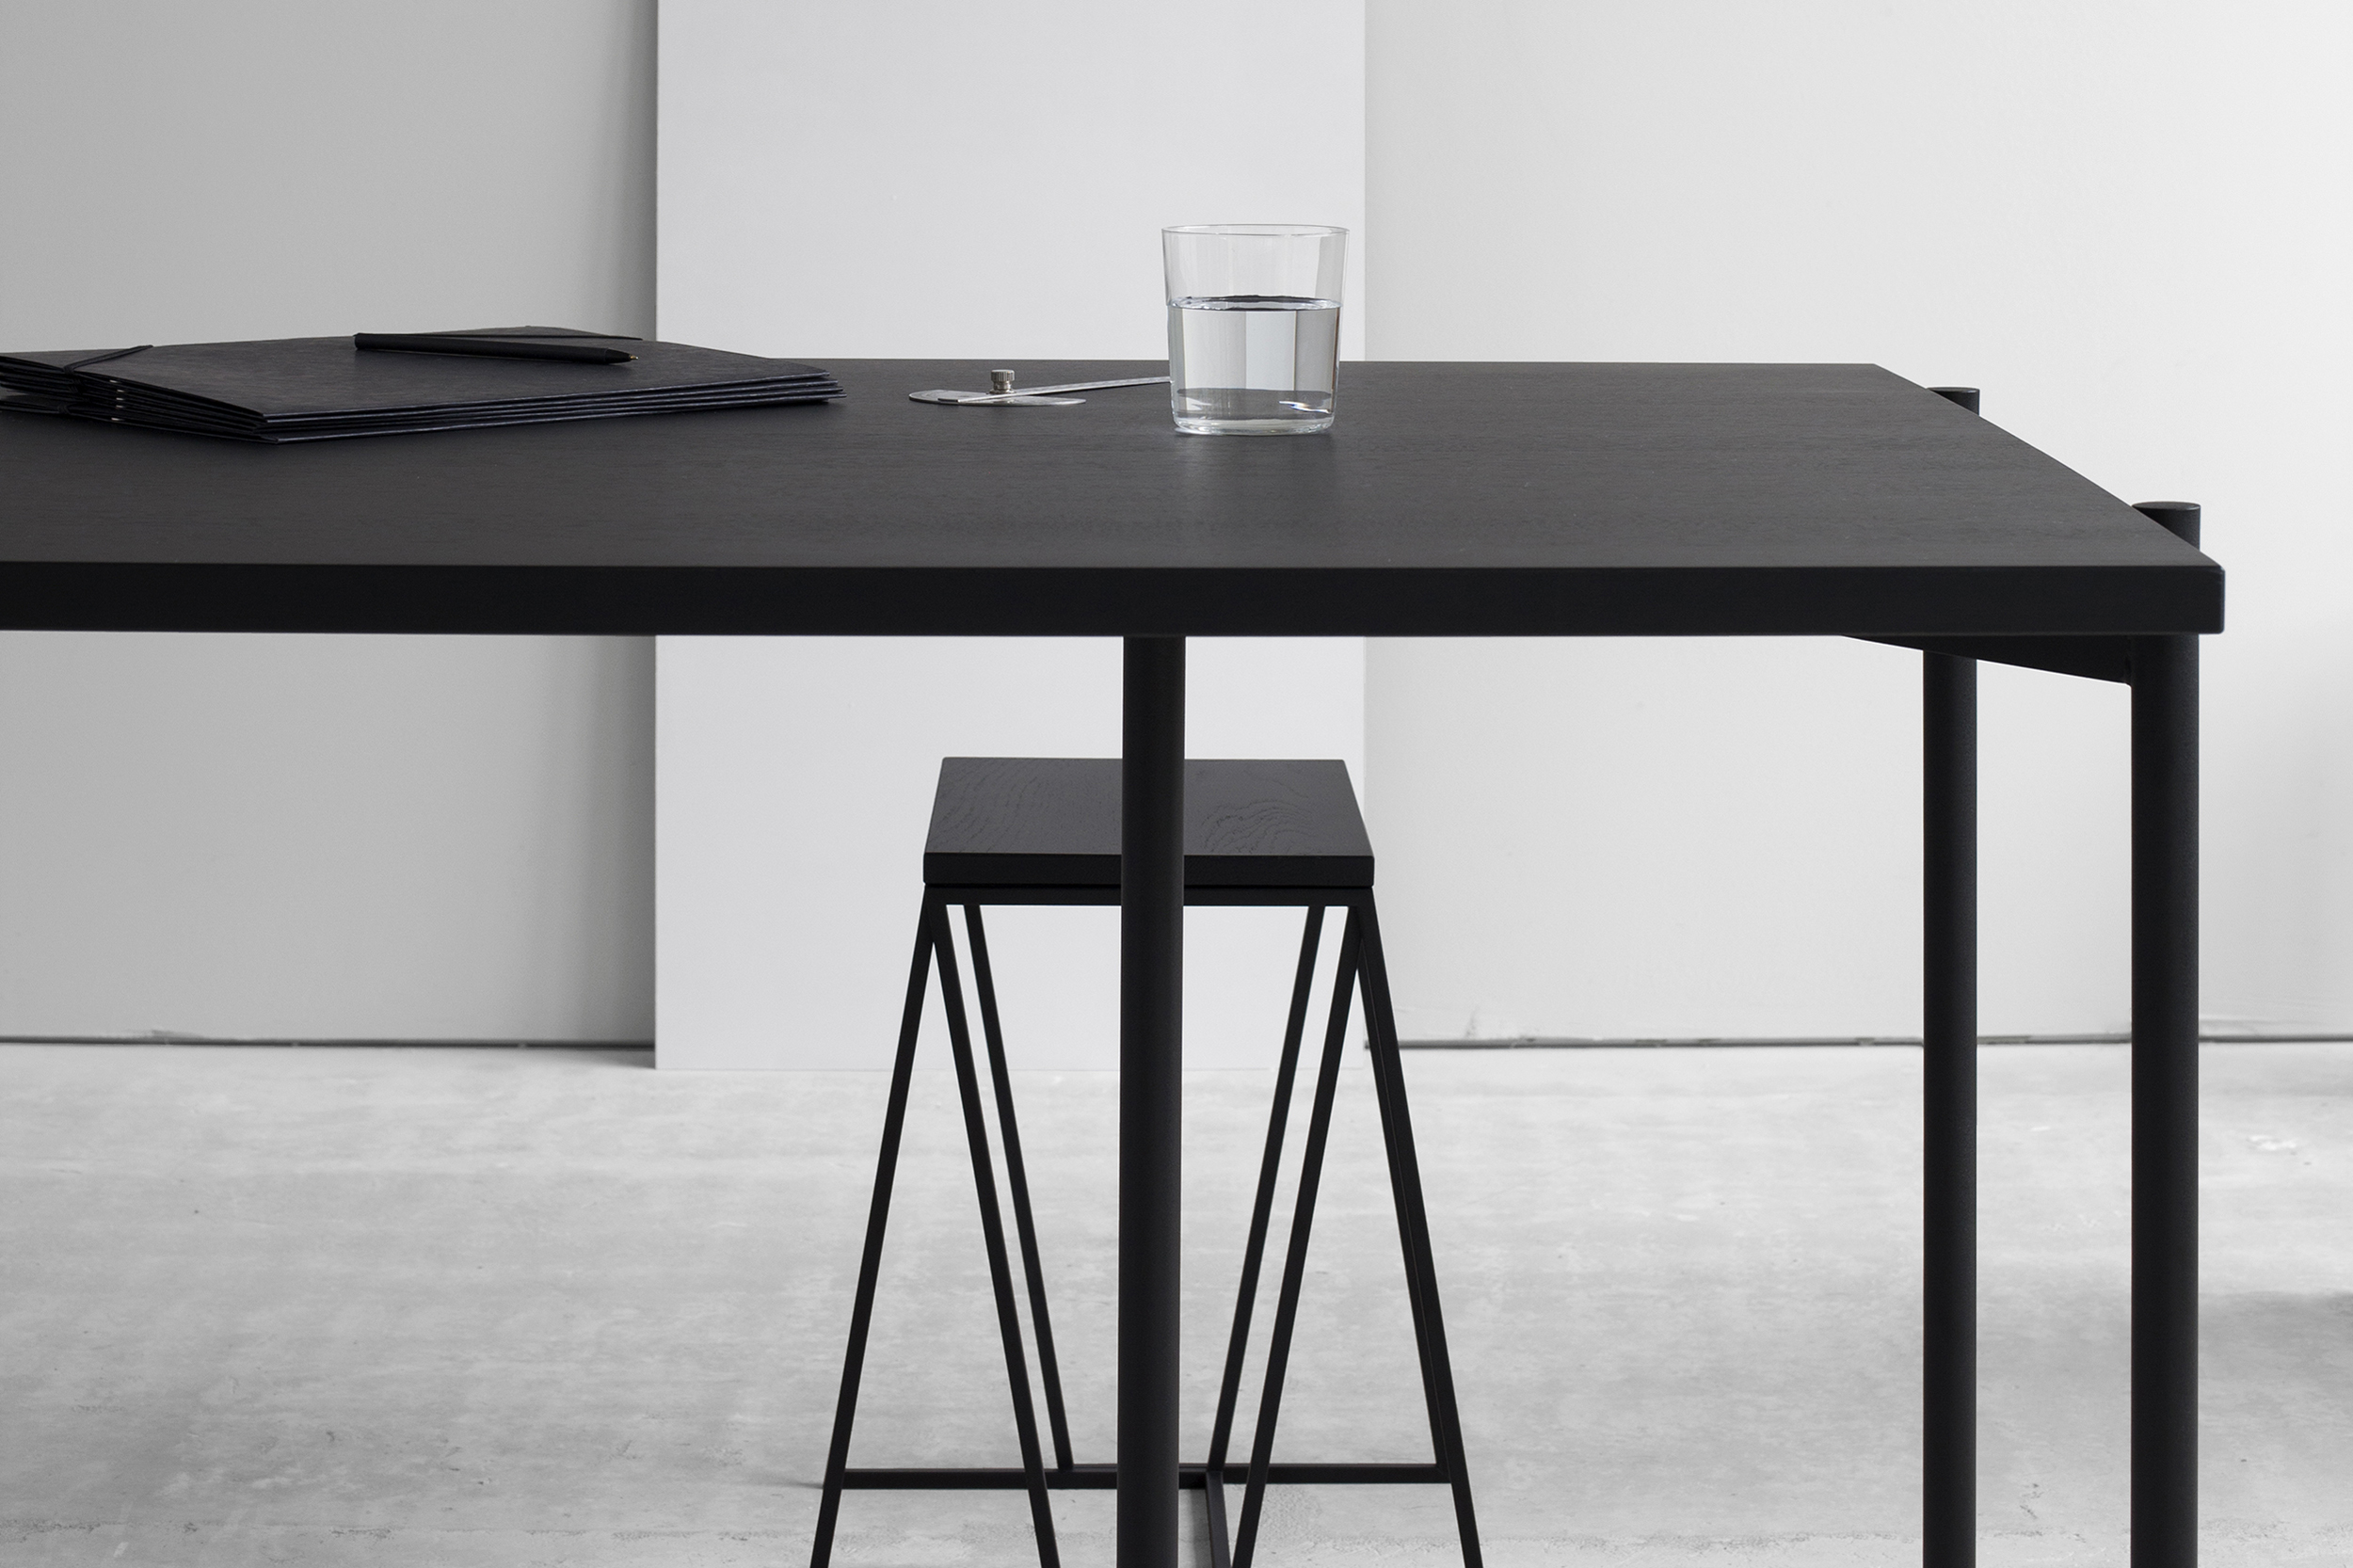 Rhomboid and Lintel table